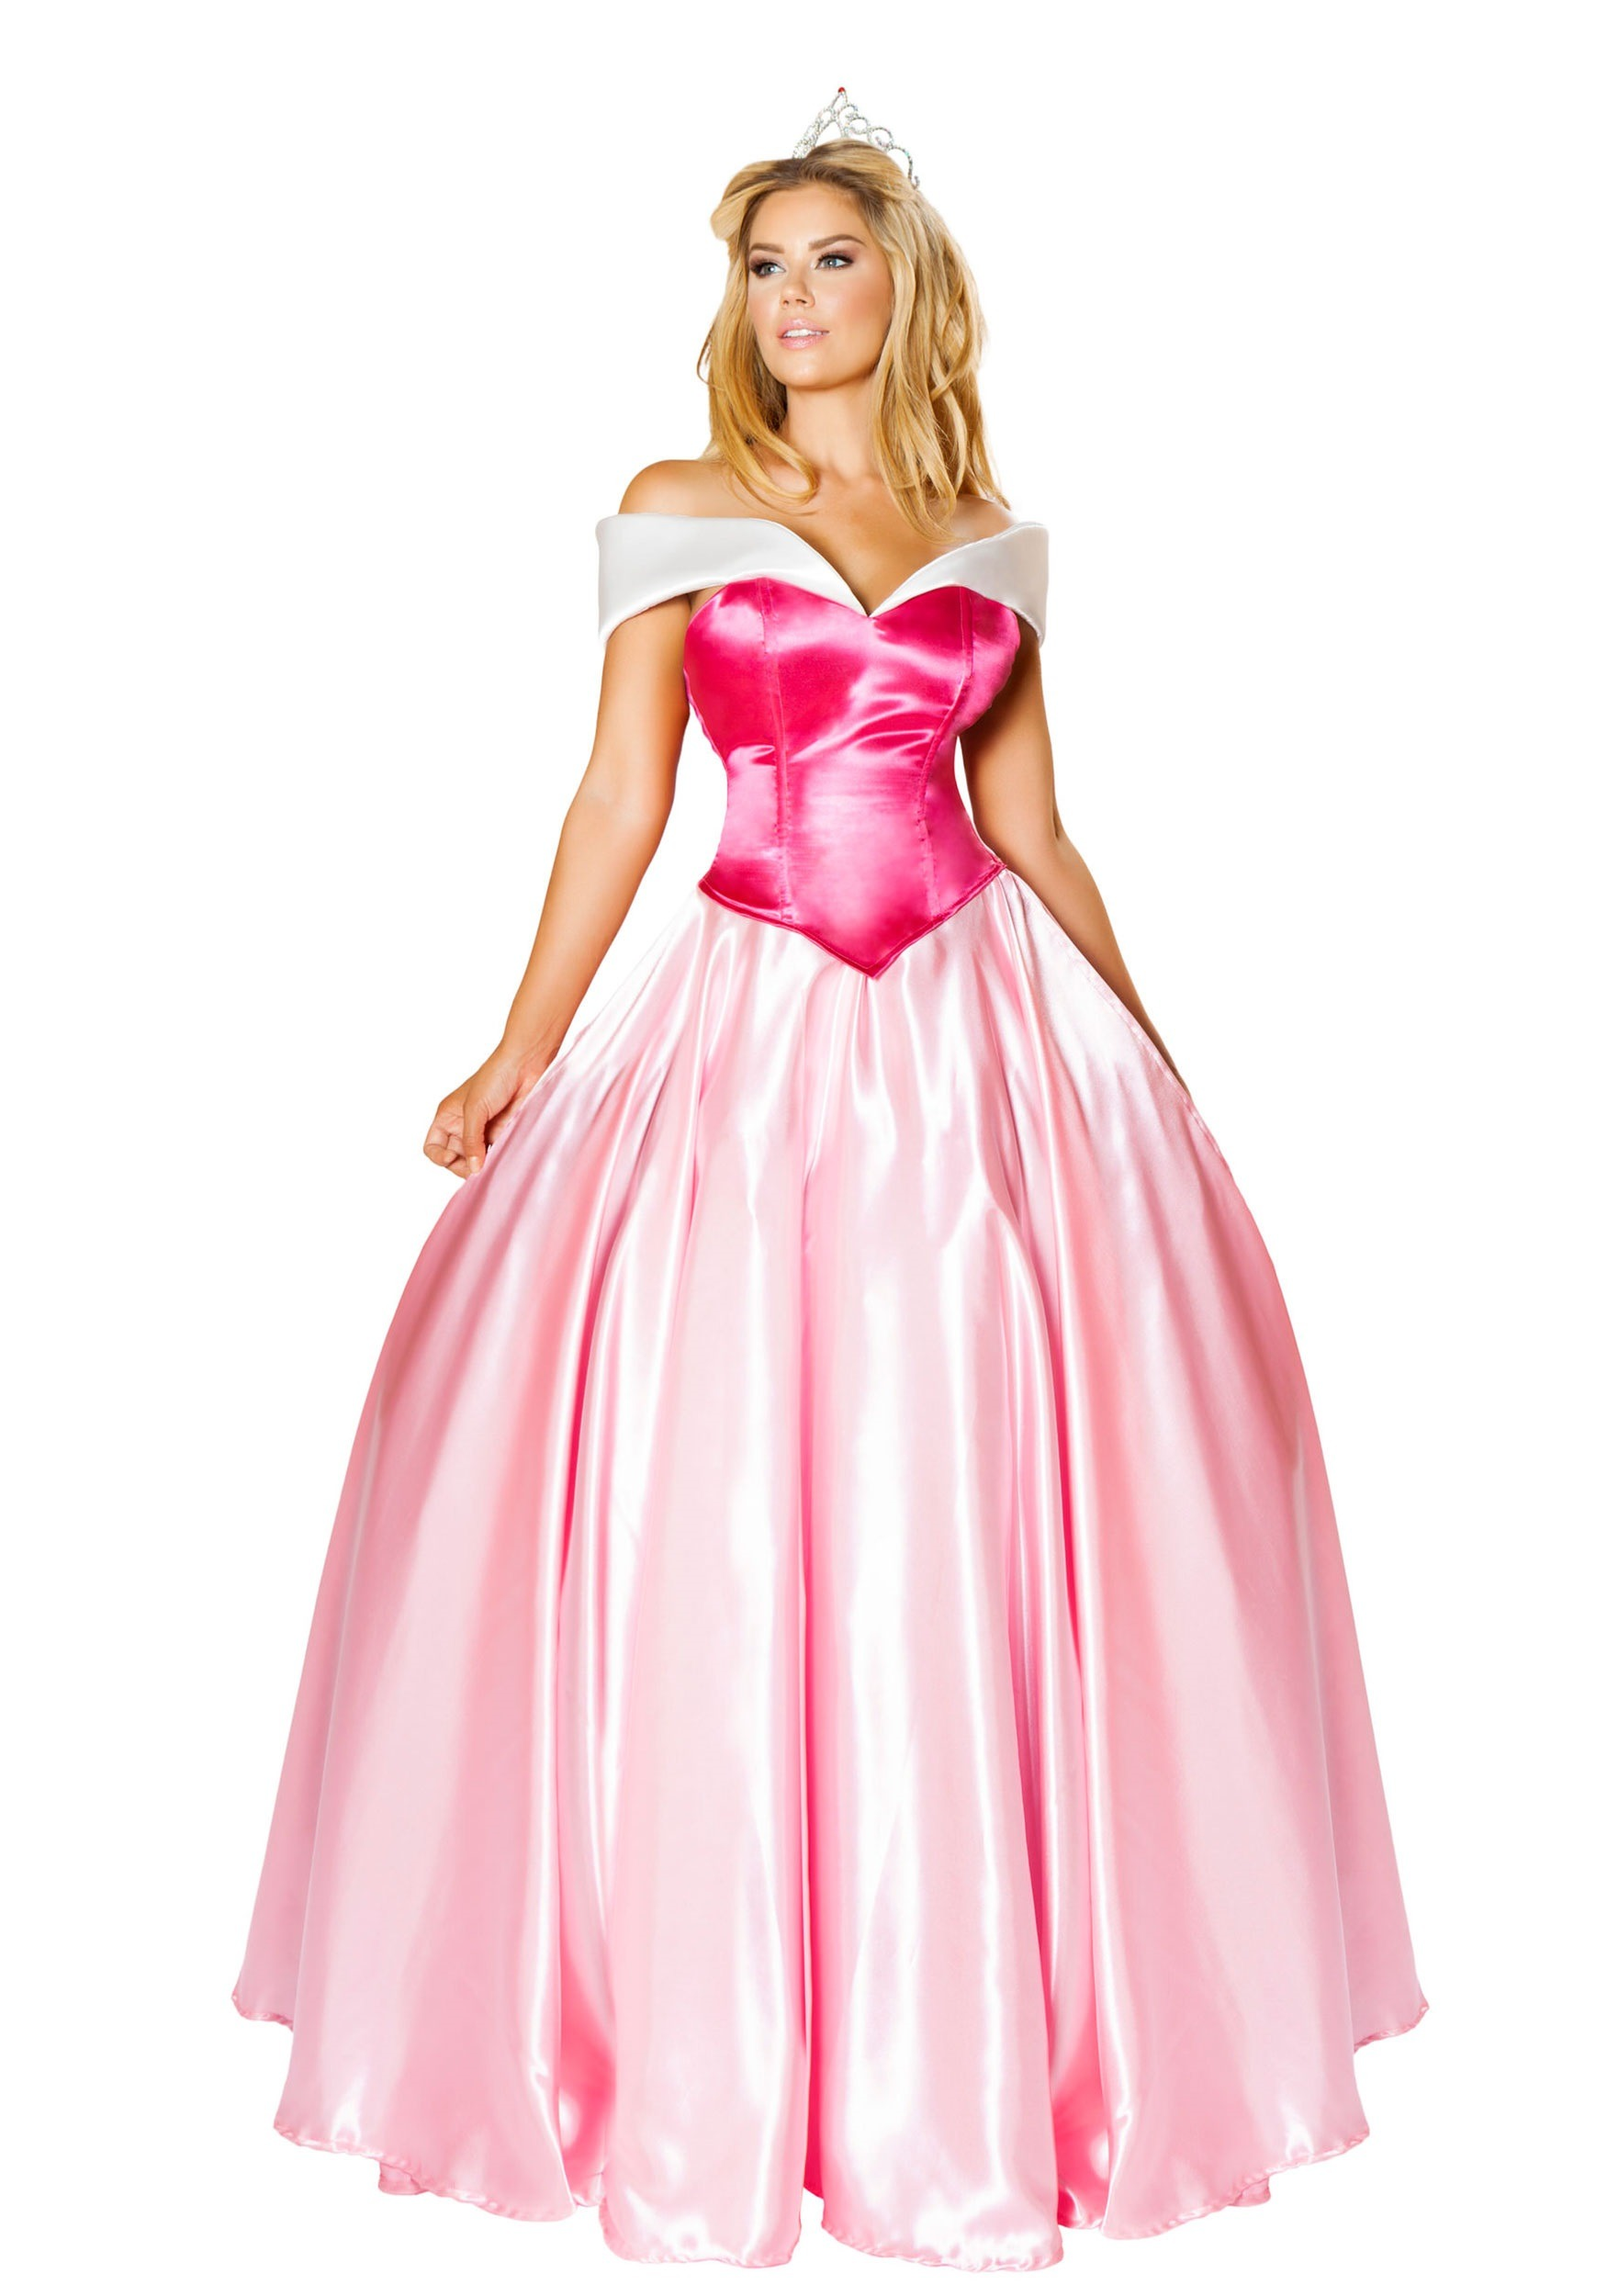 Halloween Costumes For Women Princess.Women S Beautiful Princess Costume Dress